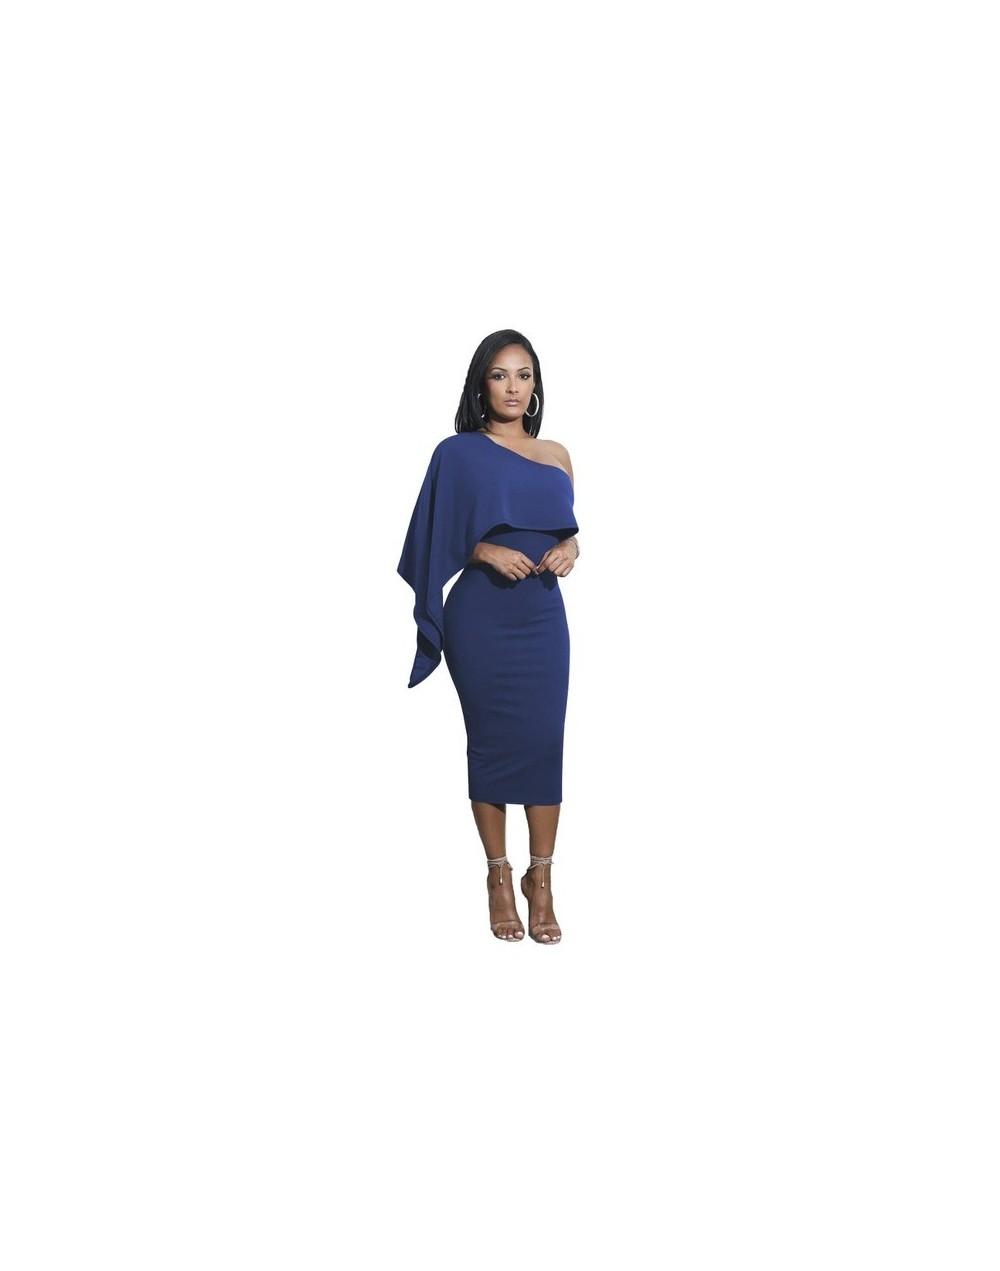 Women One-Shoulder Backless Sheath Sexy Party Dresses 2019 Autumn Slim Bodycon Dress Ruffles Mid-Calf Black White Dress Vest...